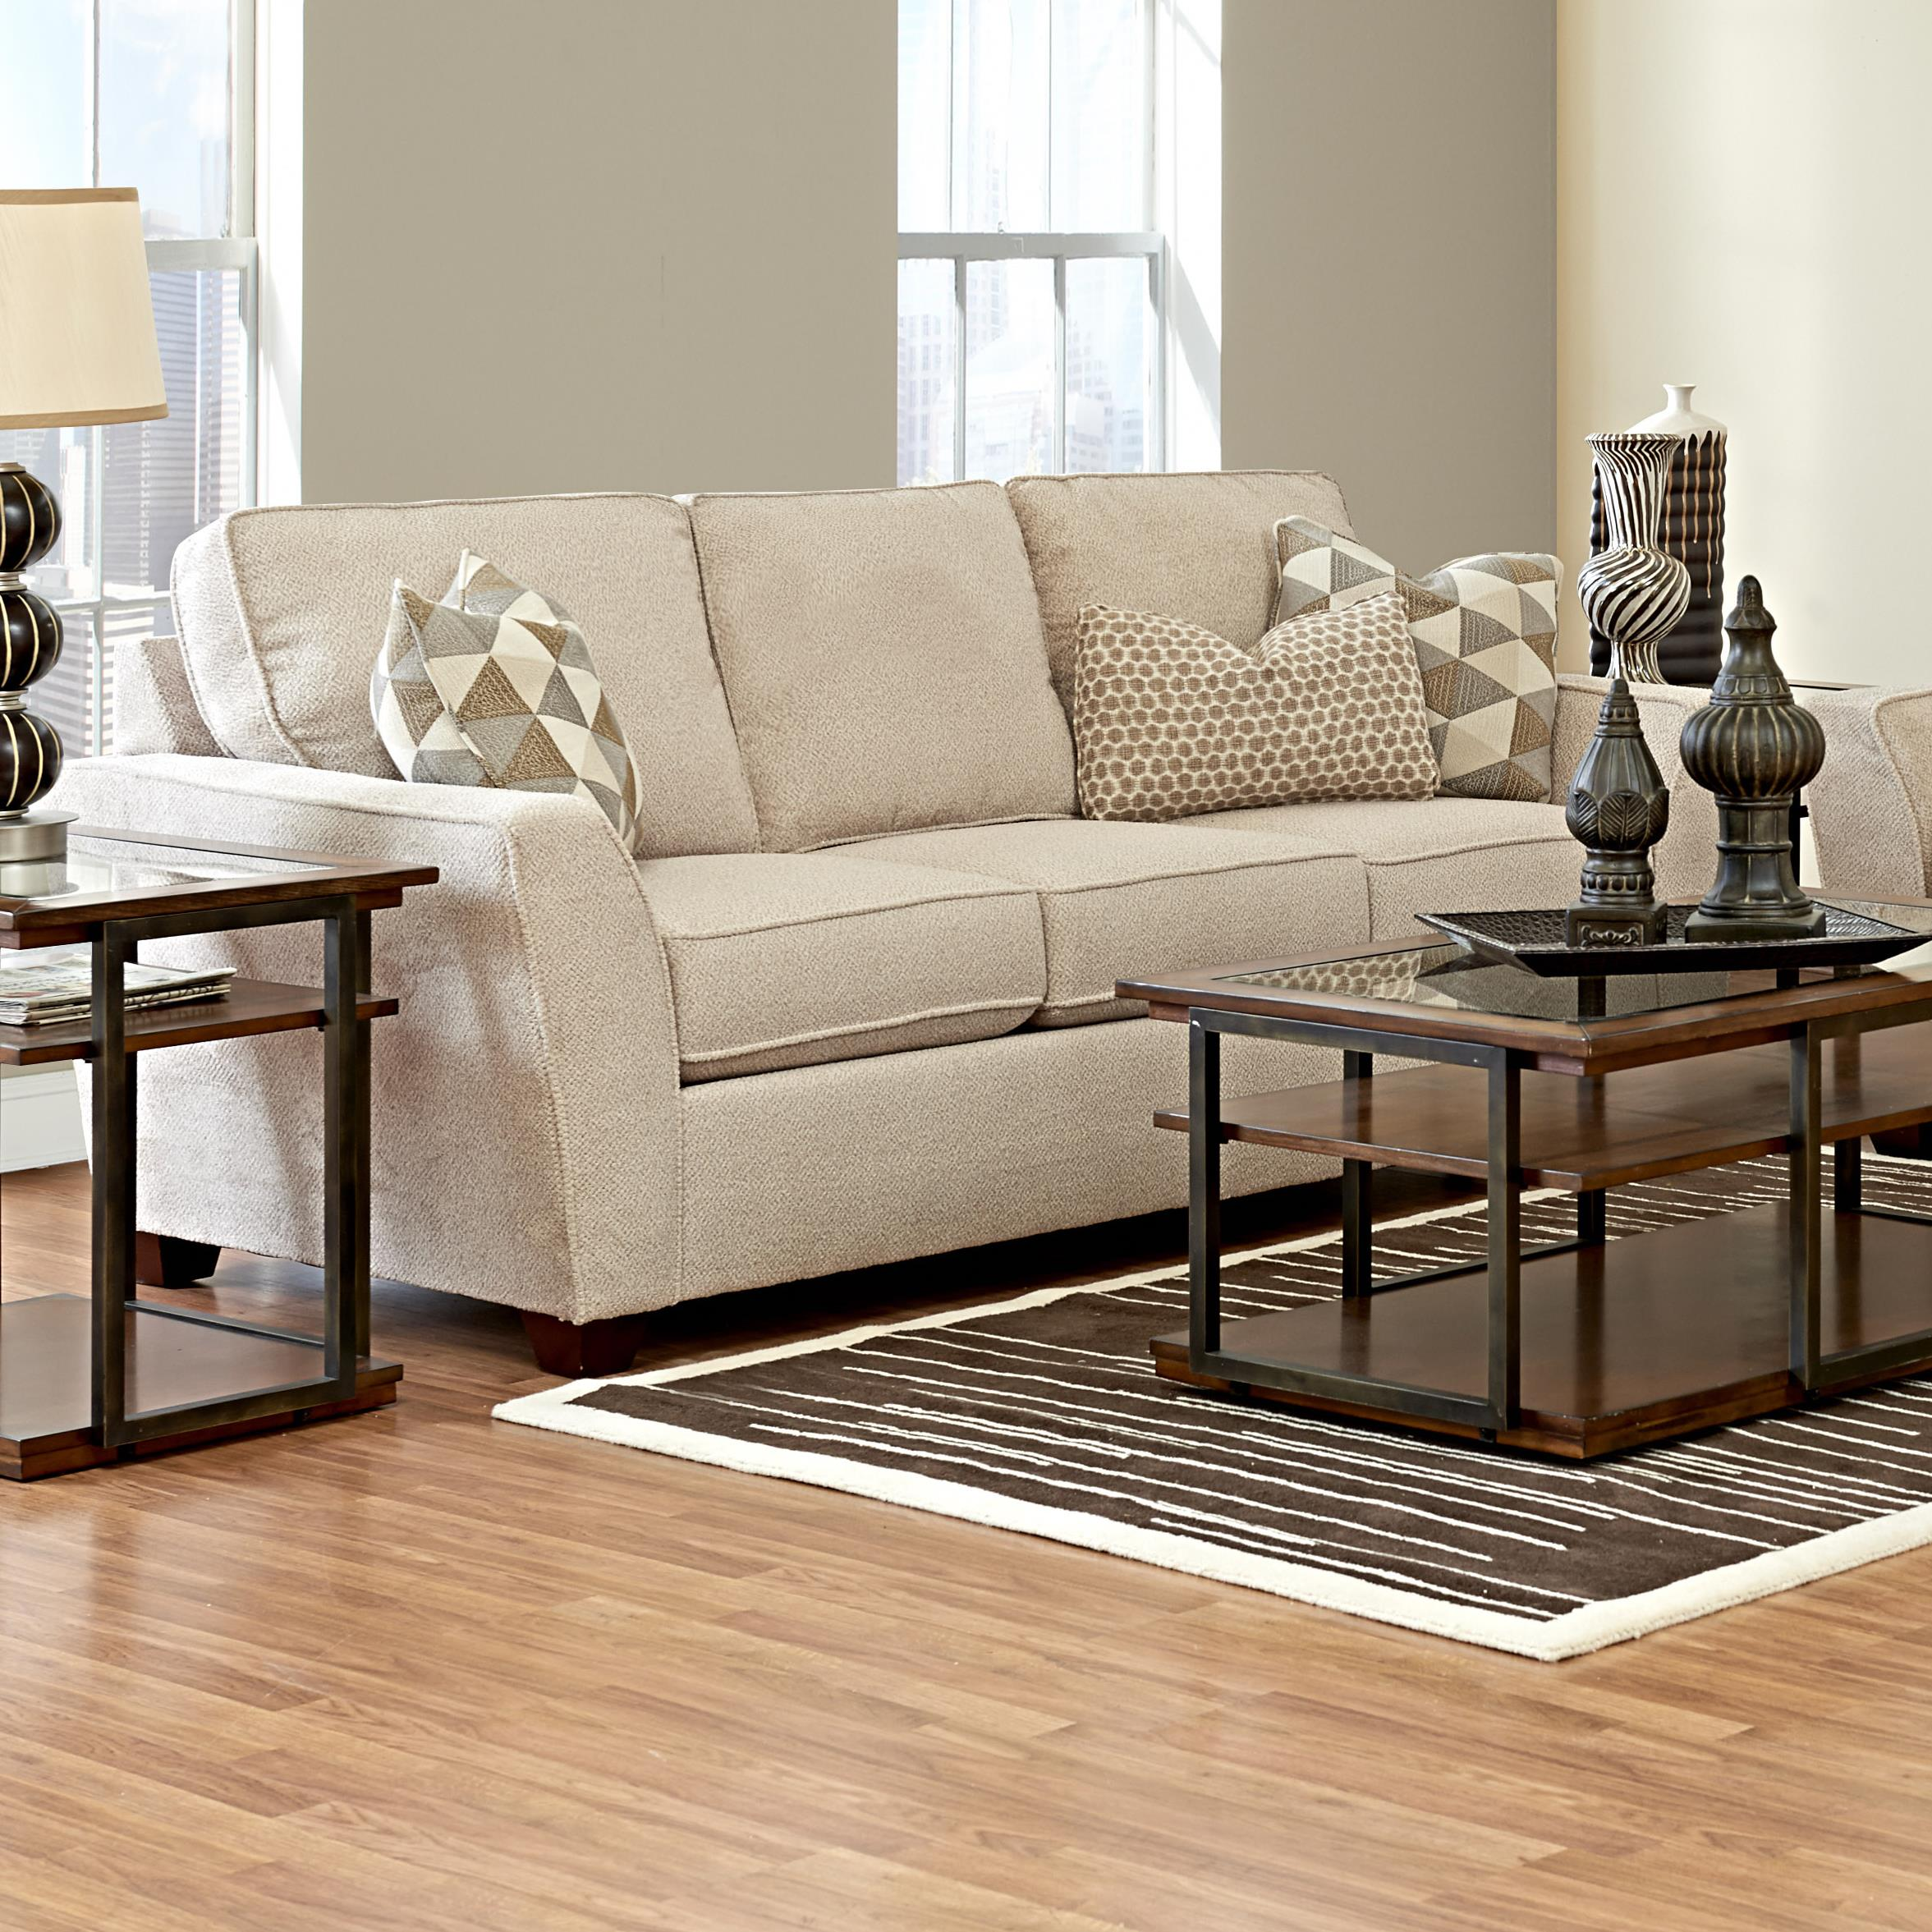 Klaussner Kent Sleeper Sofa - Item Number: K75600 IQSL-AshbyStone